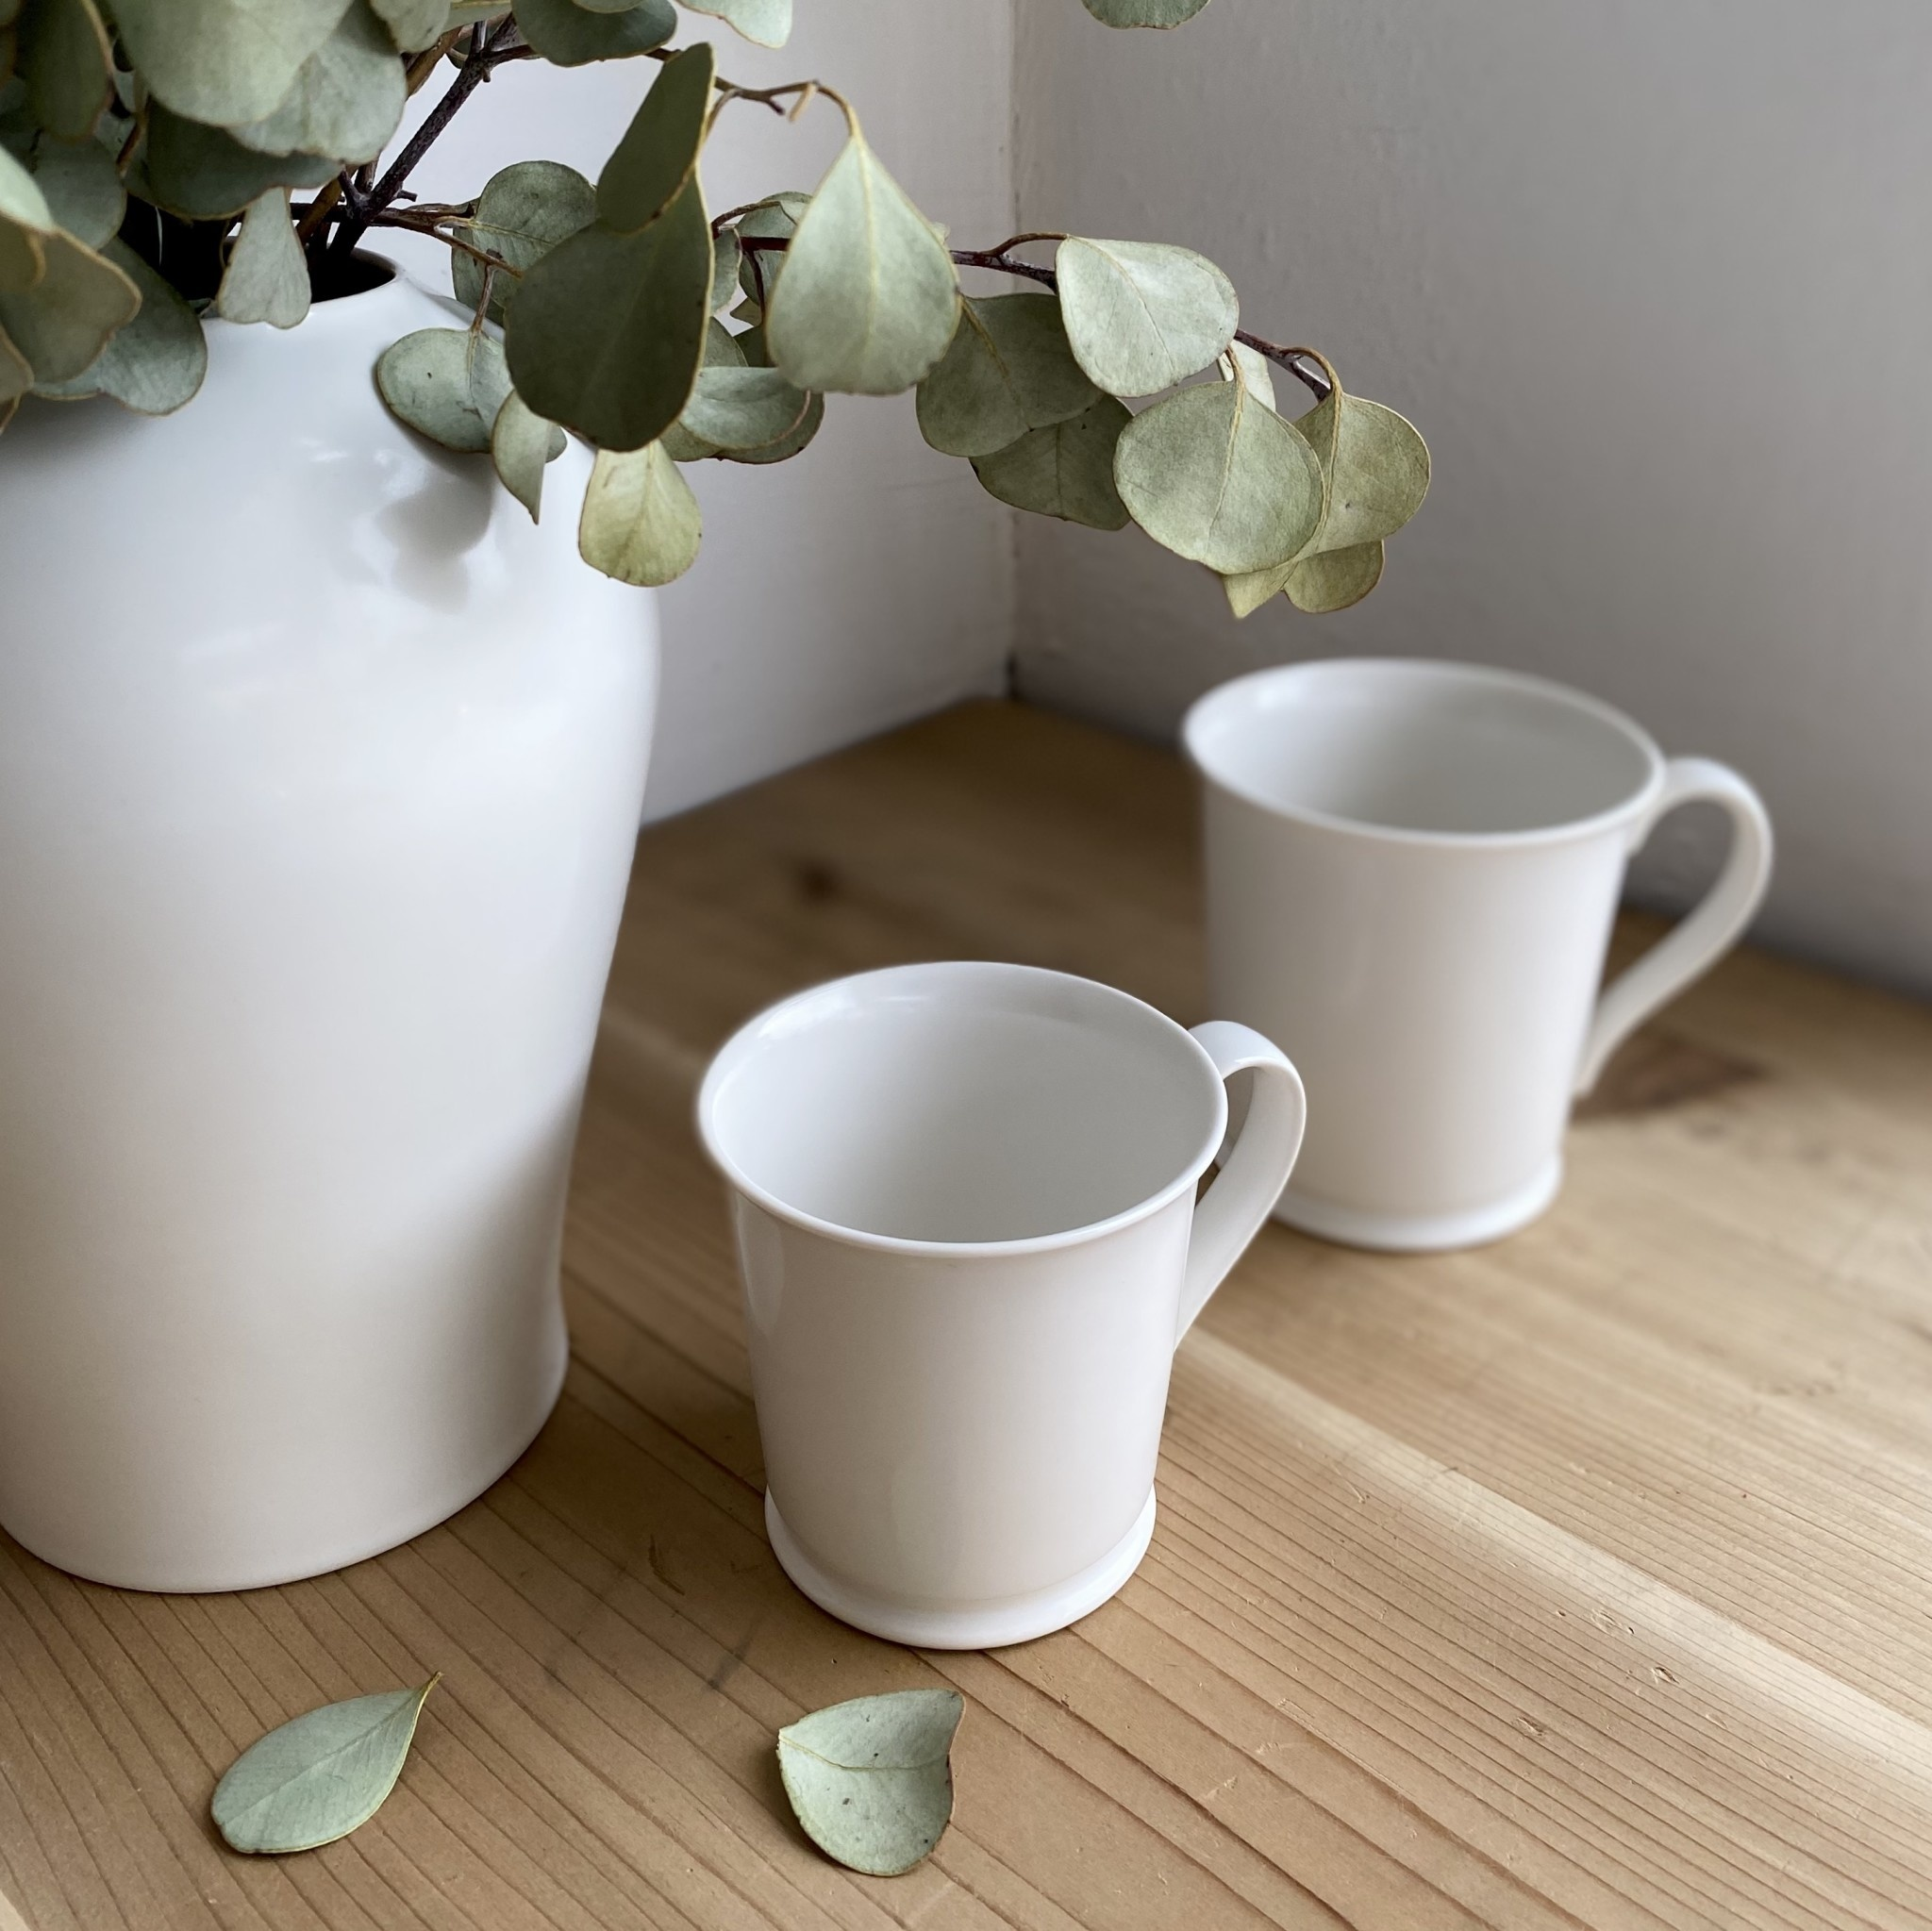 Jicon Mug - Small - 3''